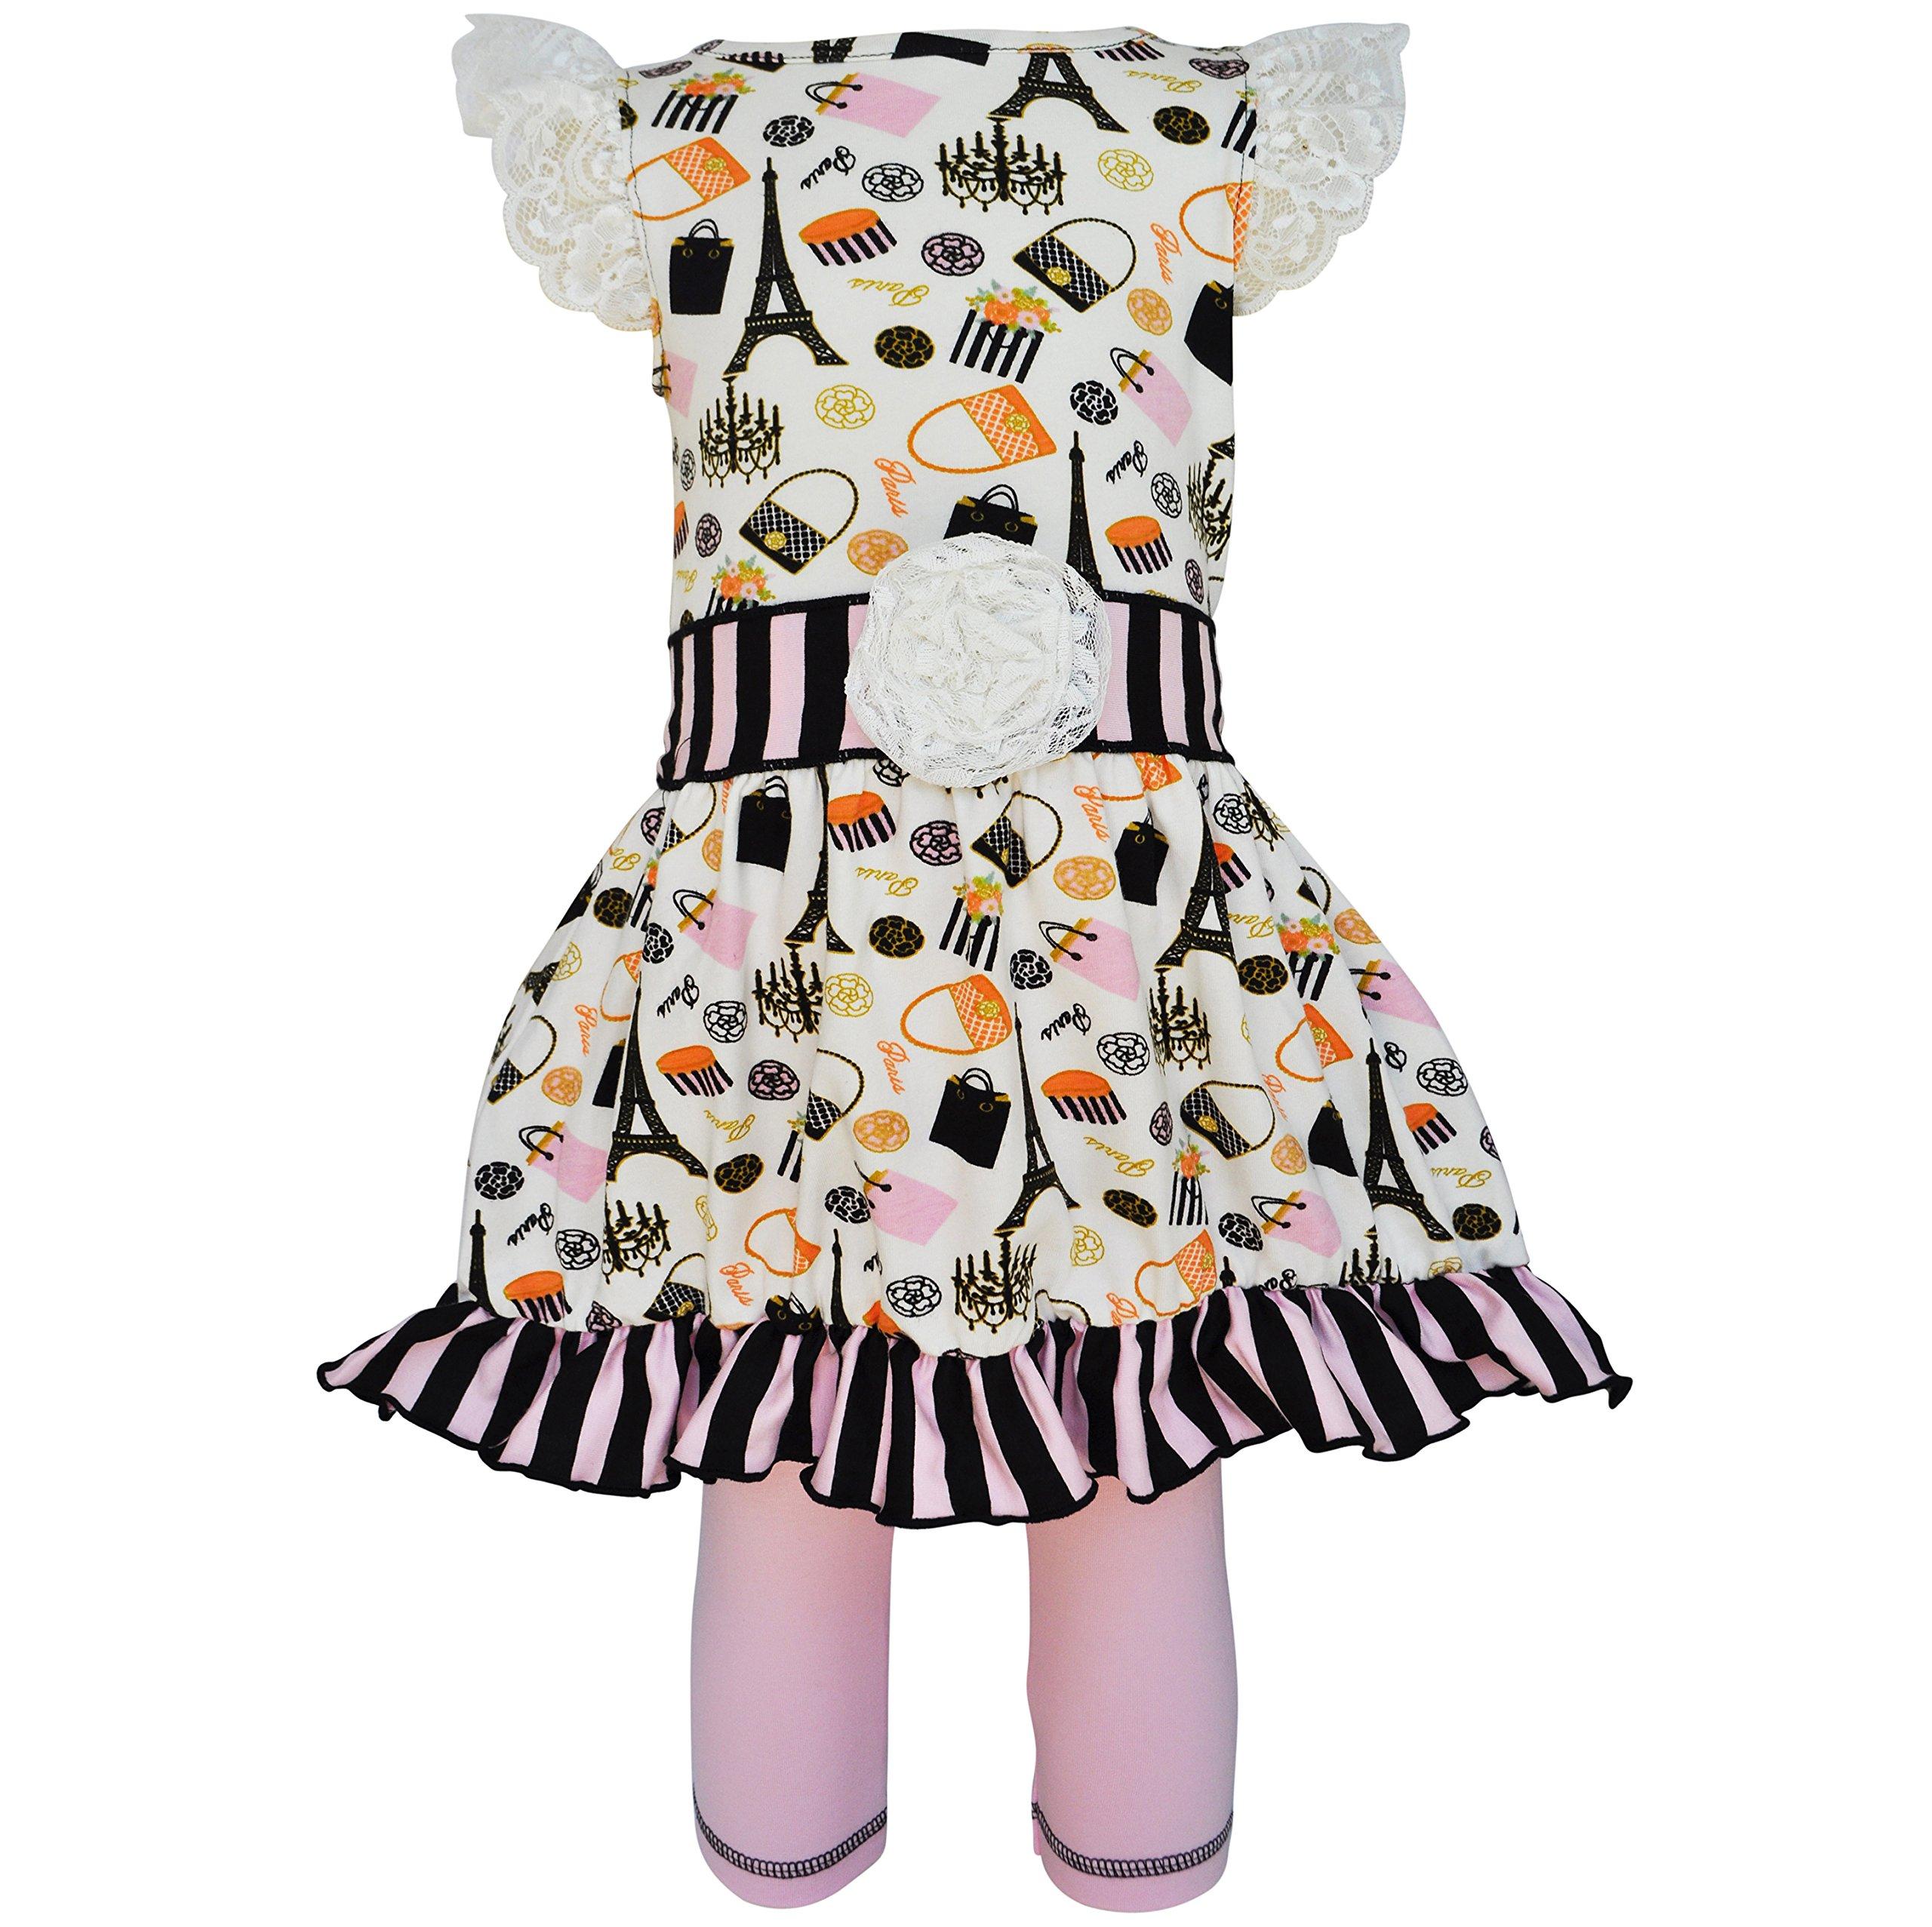 AnnLoren Paris Posh Eiffel Tower Girls Cotton Dress and Stripes Legging Outfit